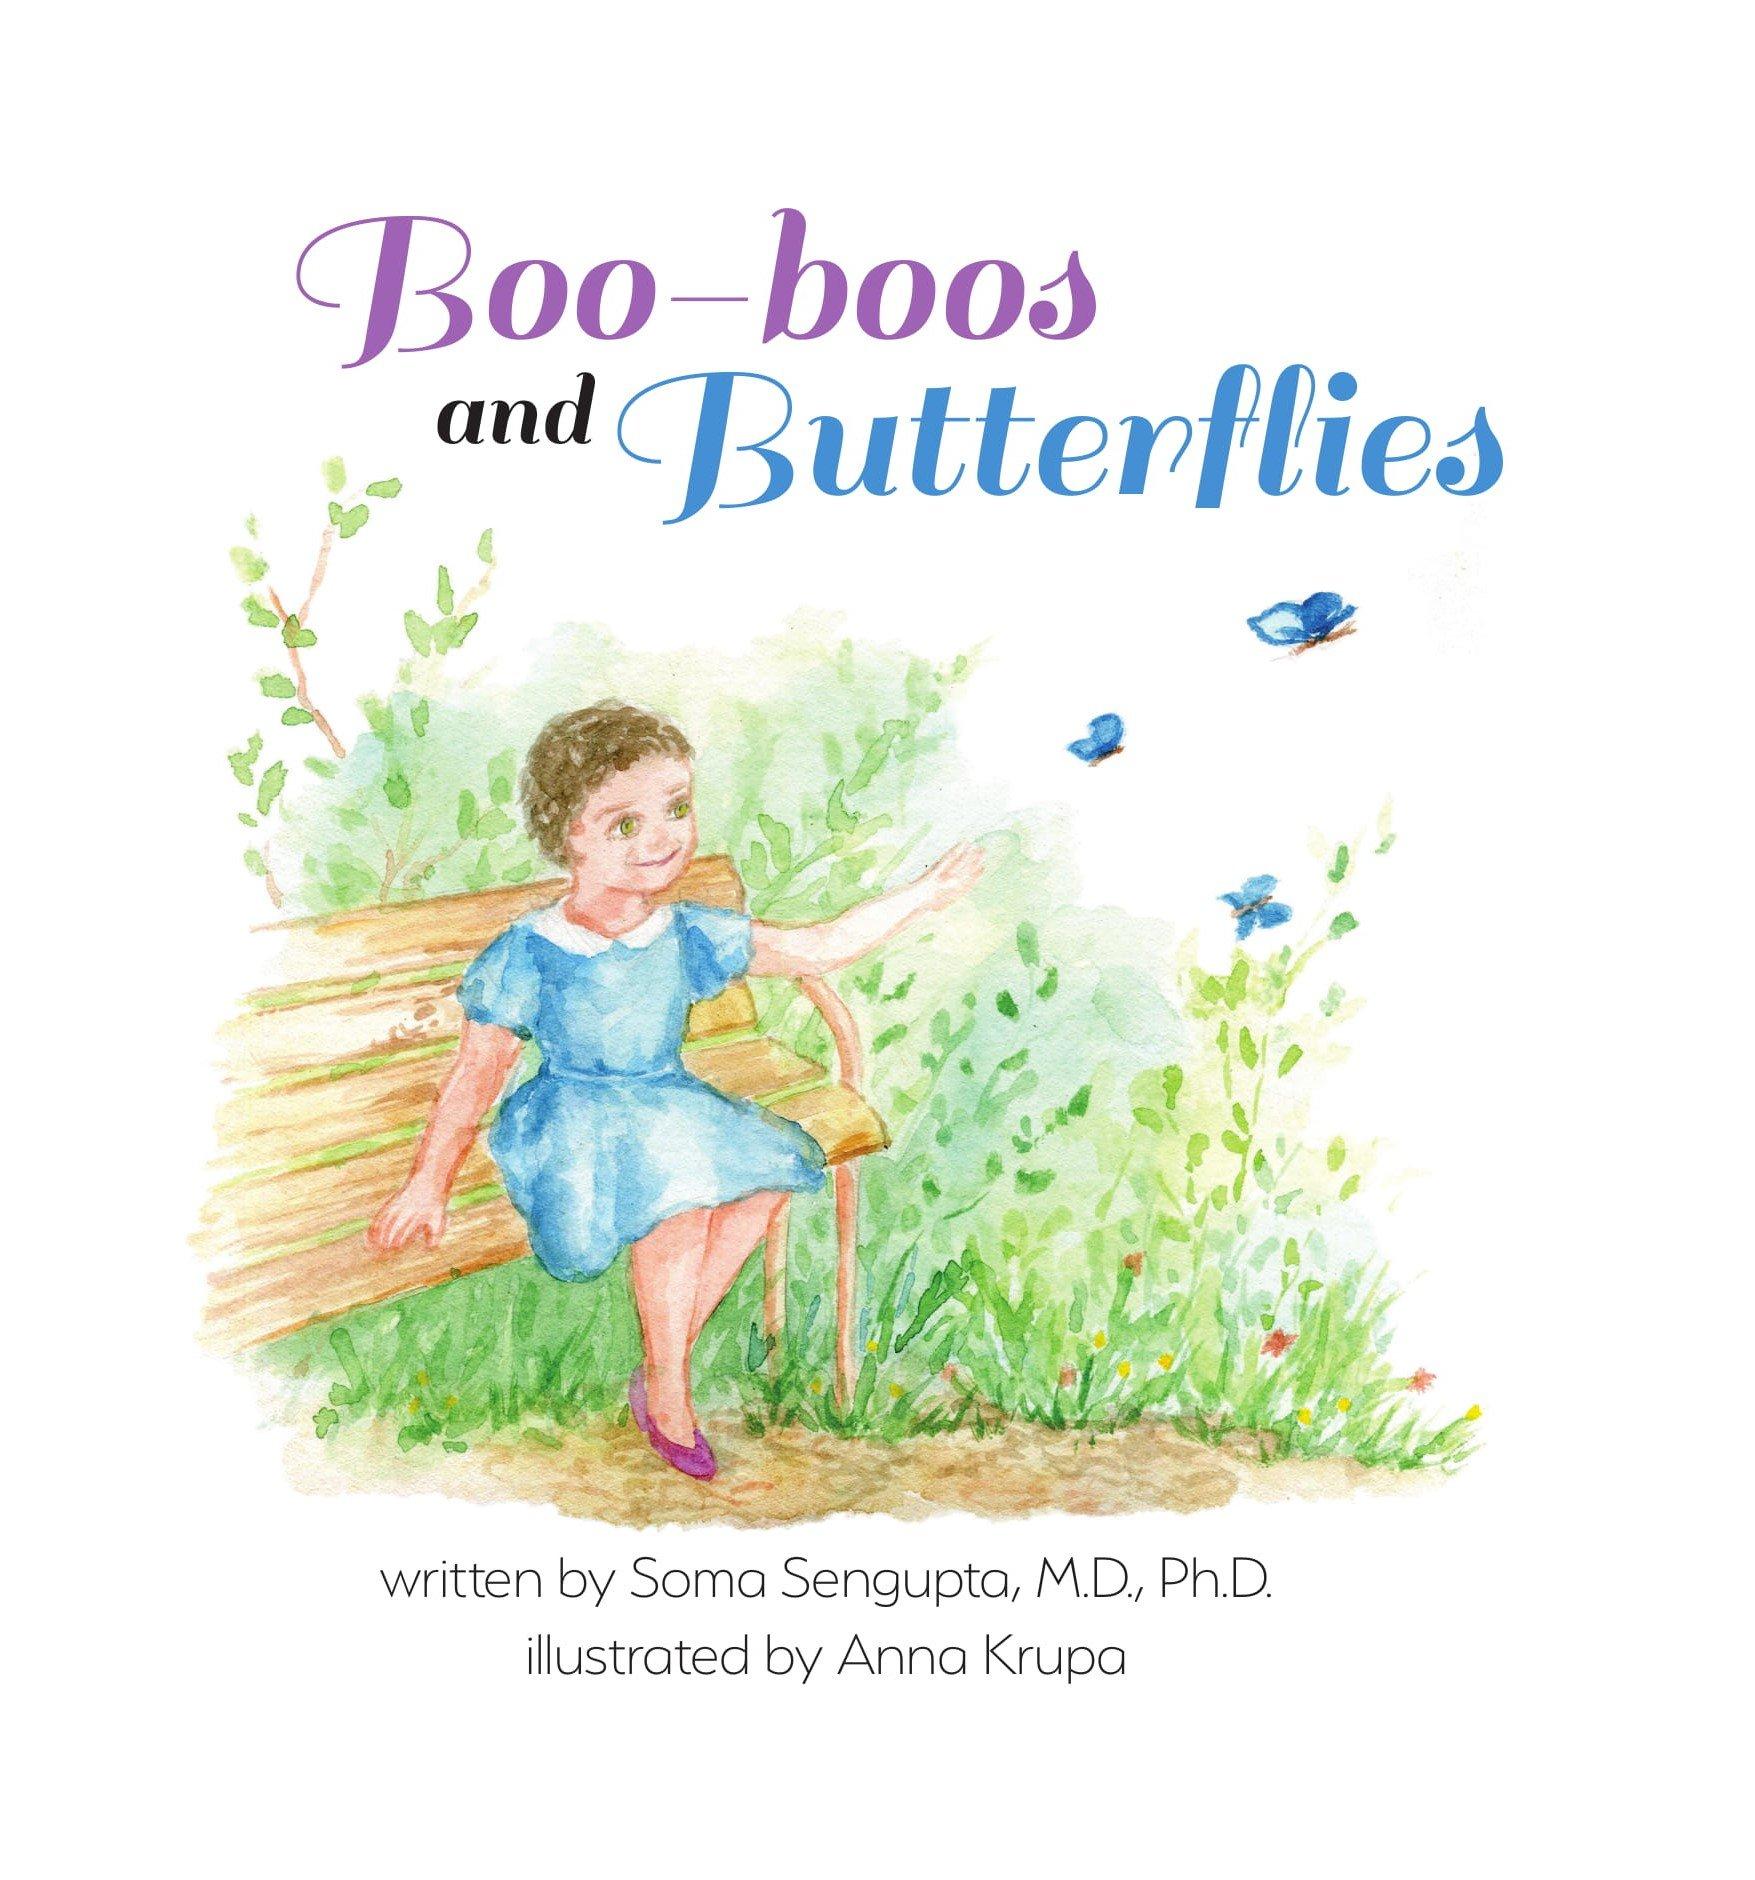 Boo-boos and Butterflies ebook